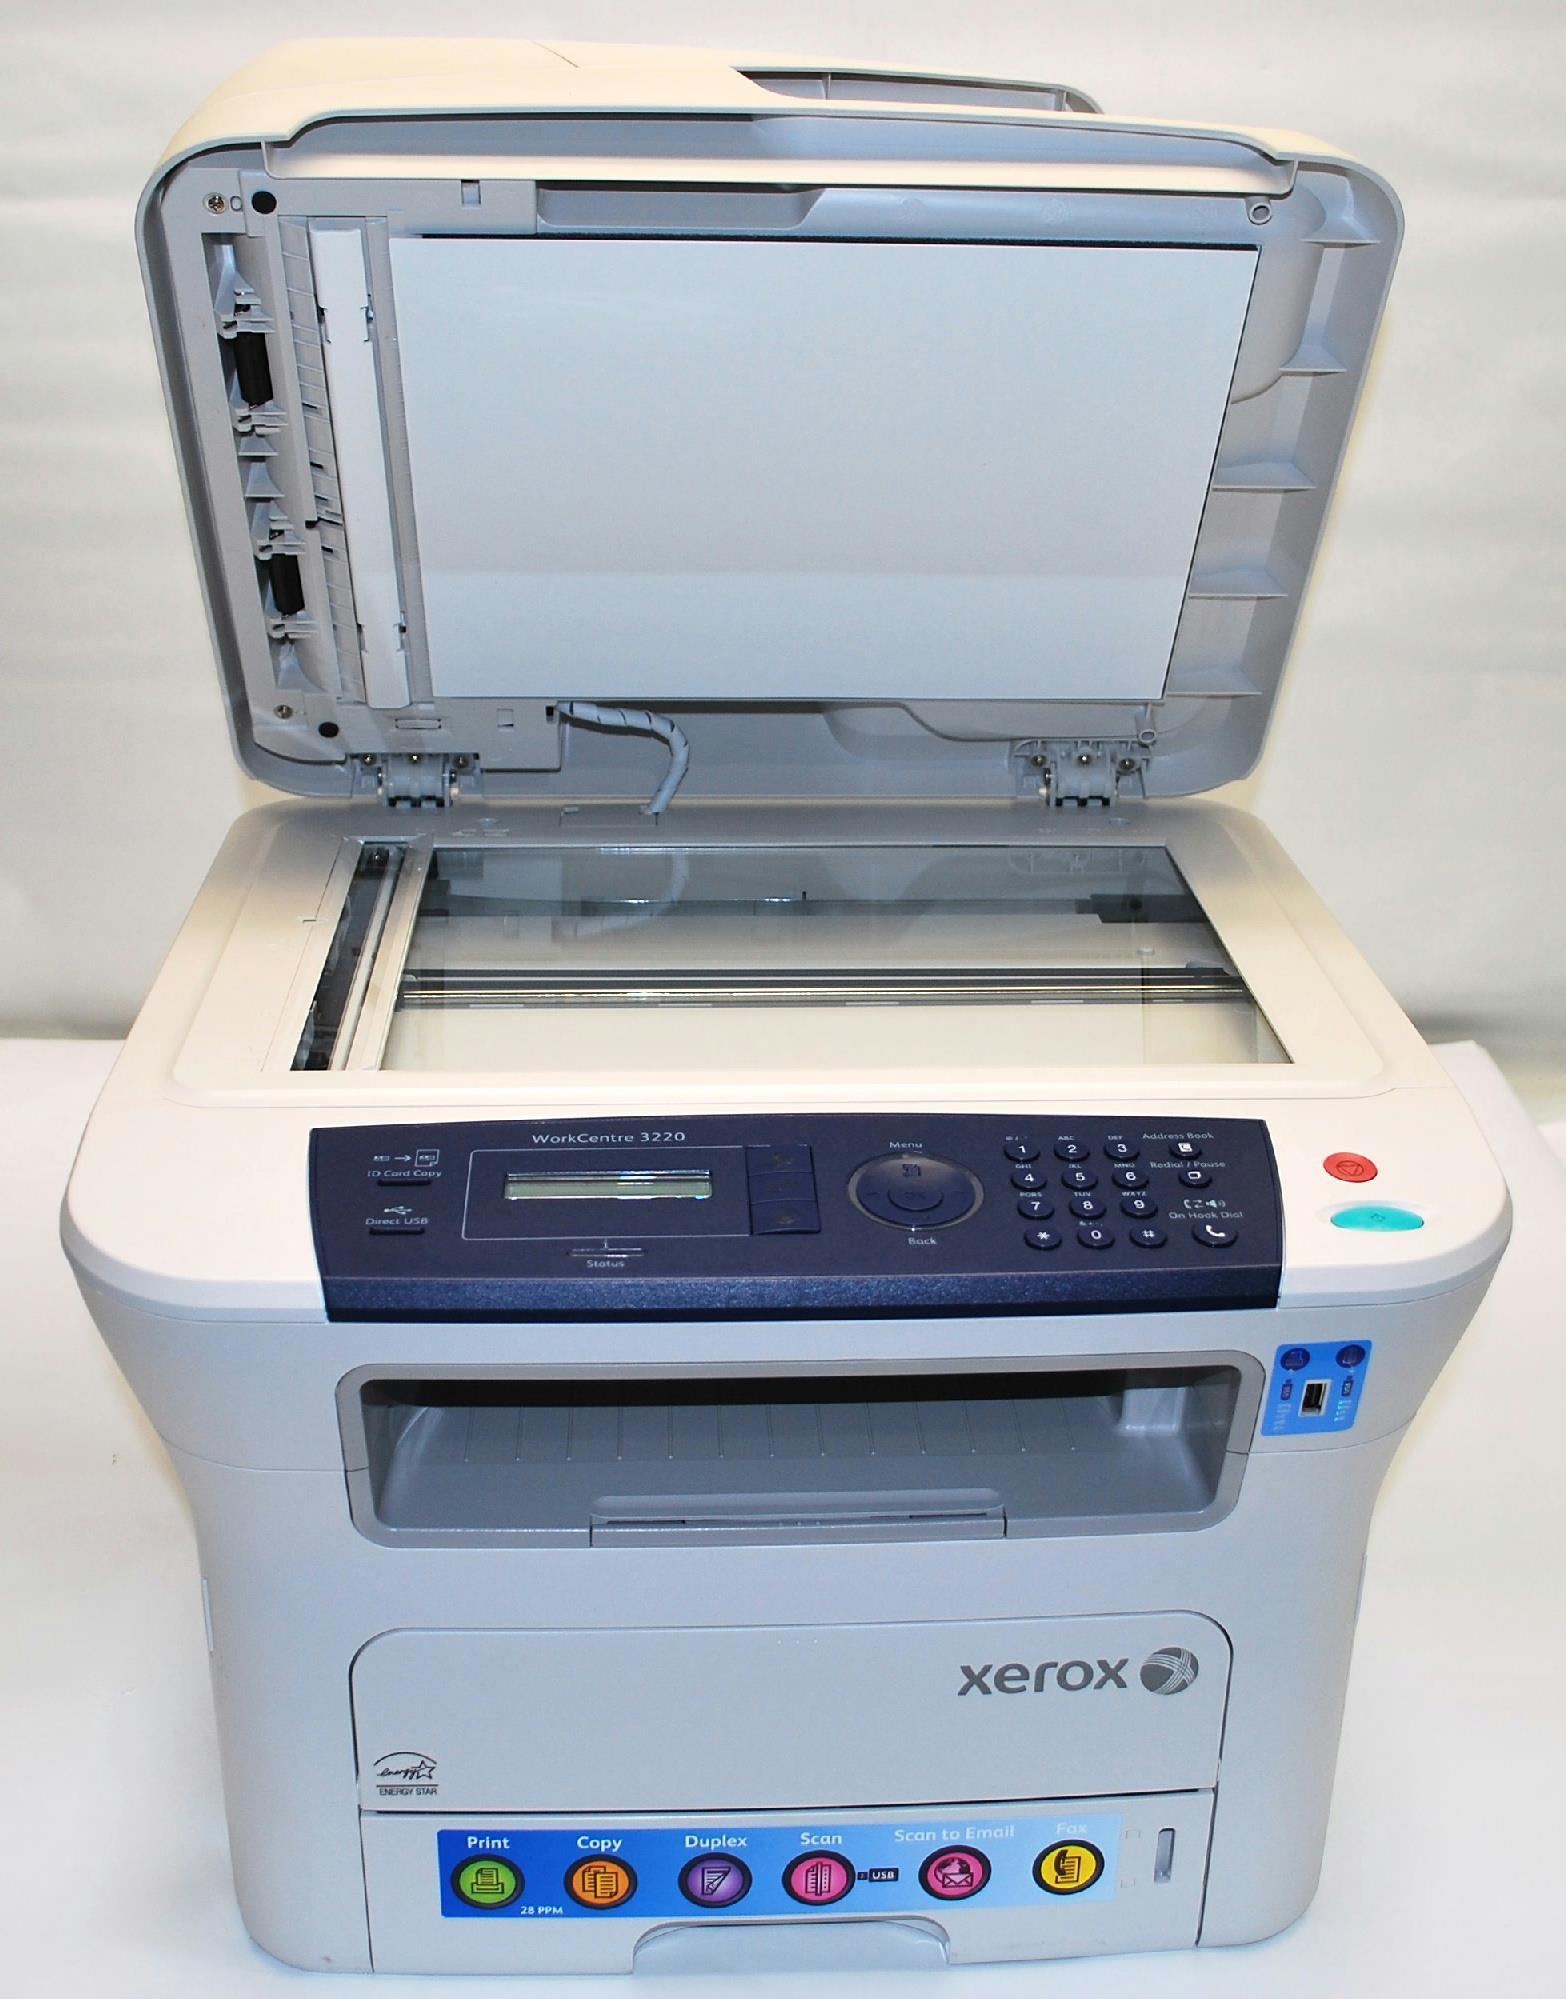 Xerox color laser printers - Manufacturer Xerox